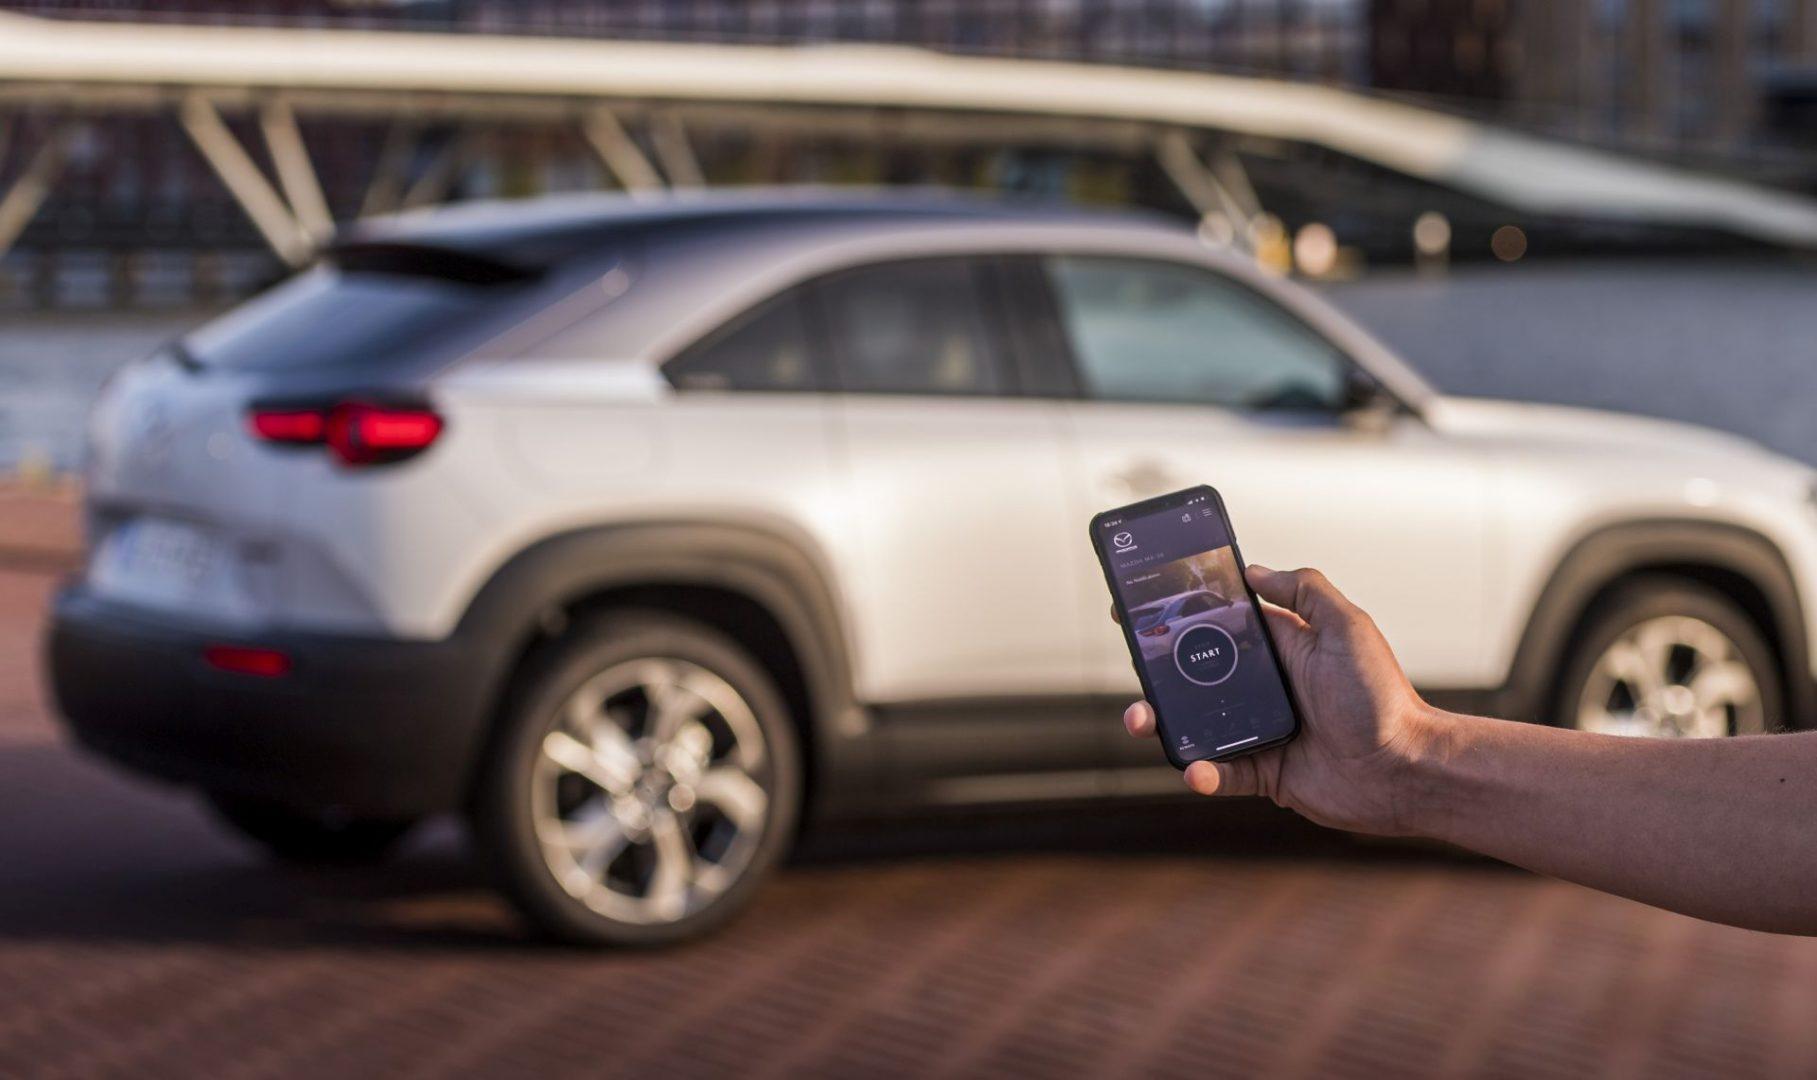 MyMazda je nova aplikacija za vlasnike Mazda vozila